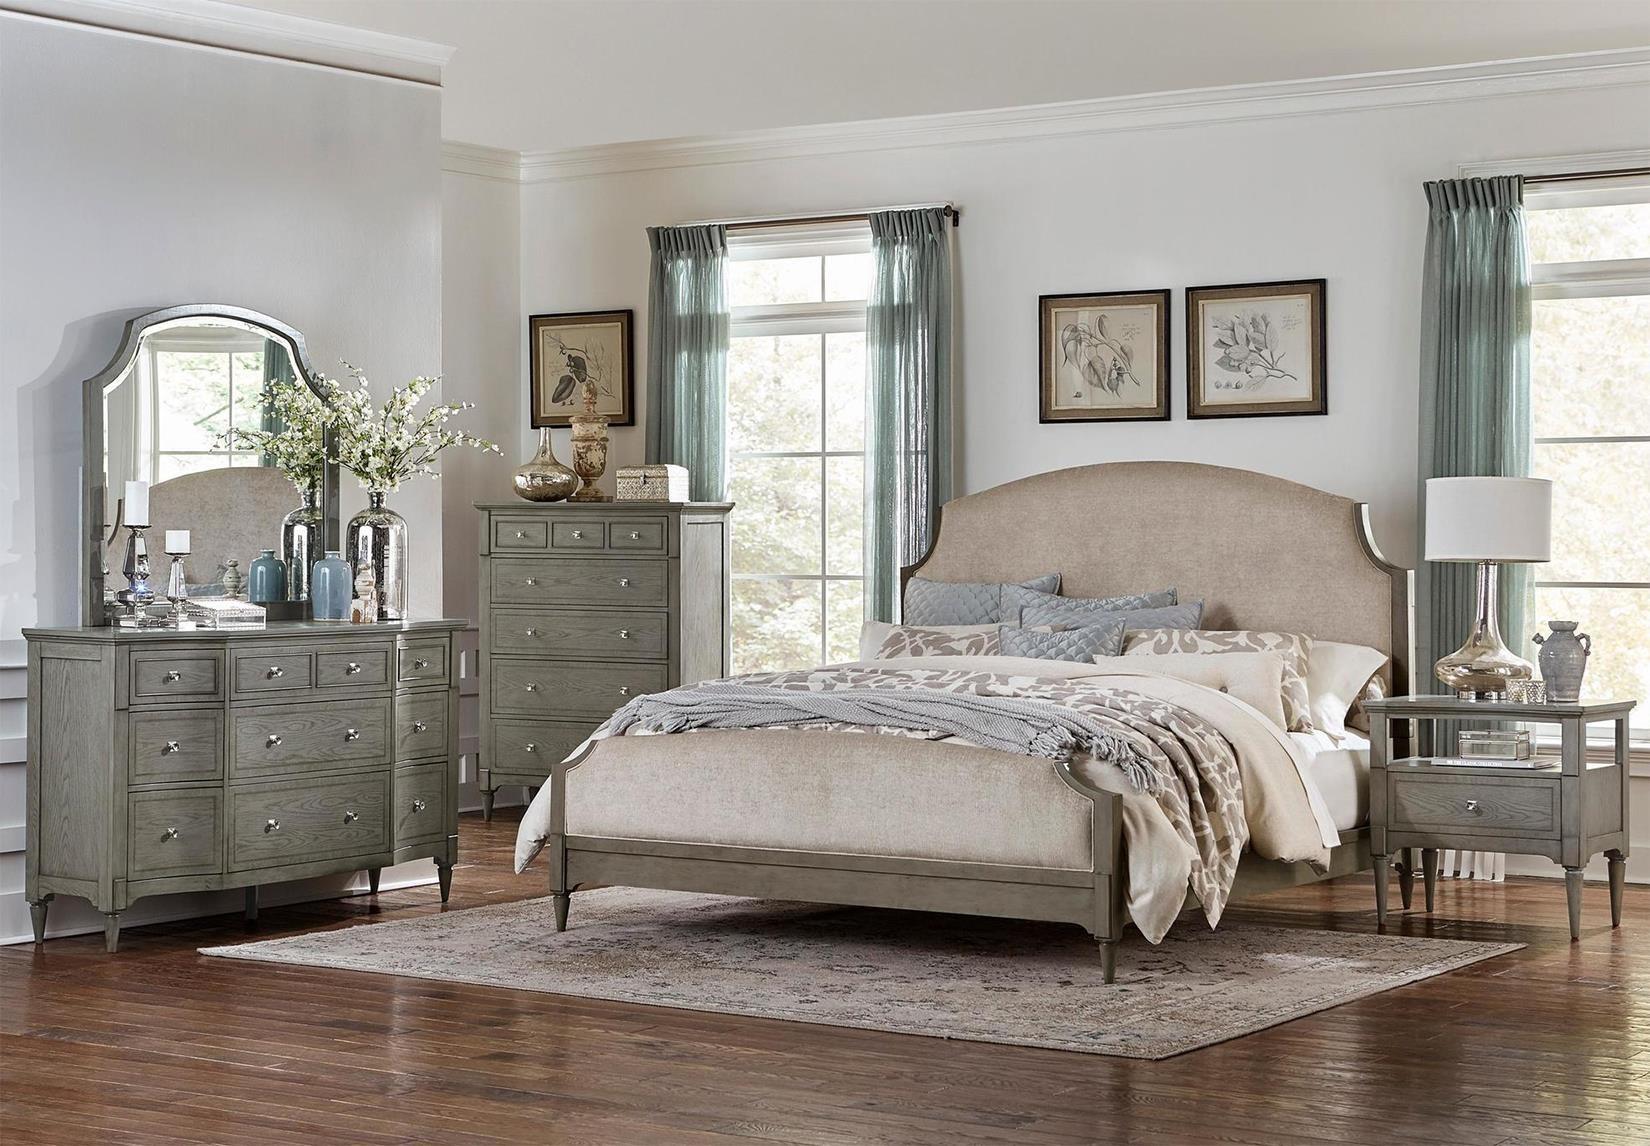 Madeleine 5PC Queen Bedroom Set at Rotmans